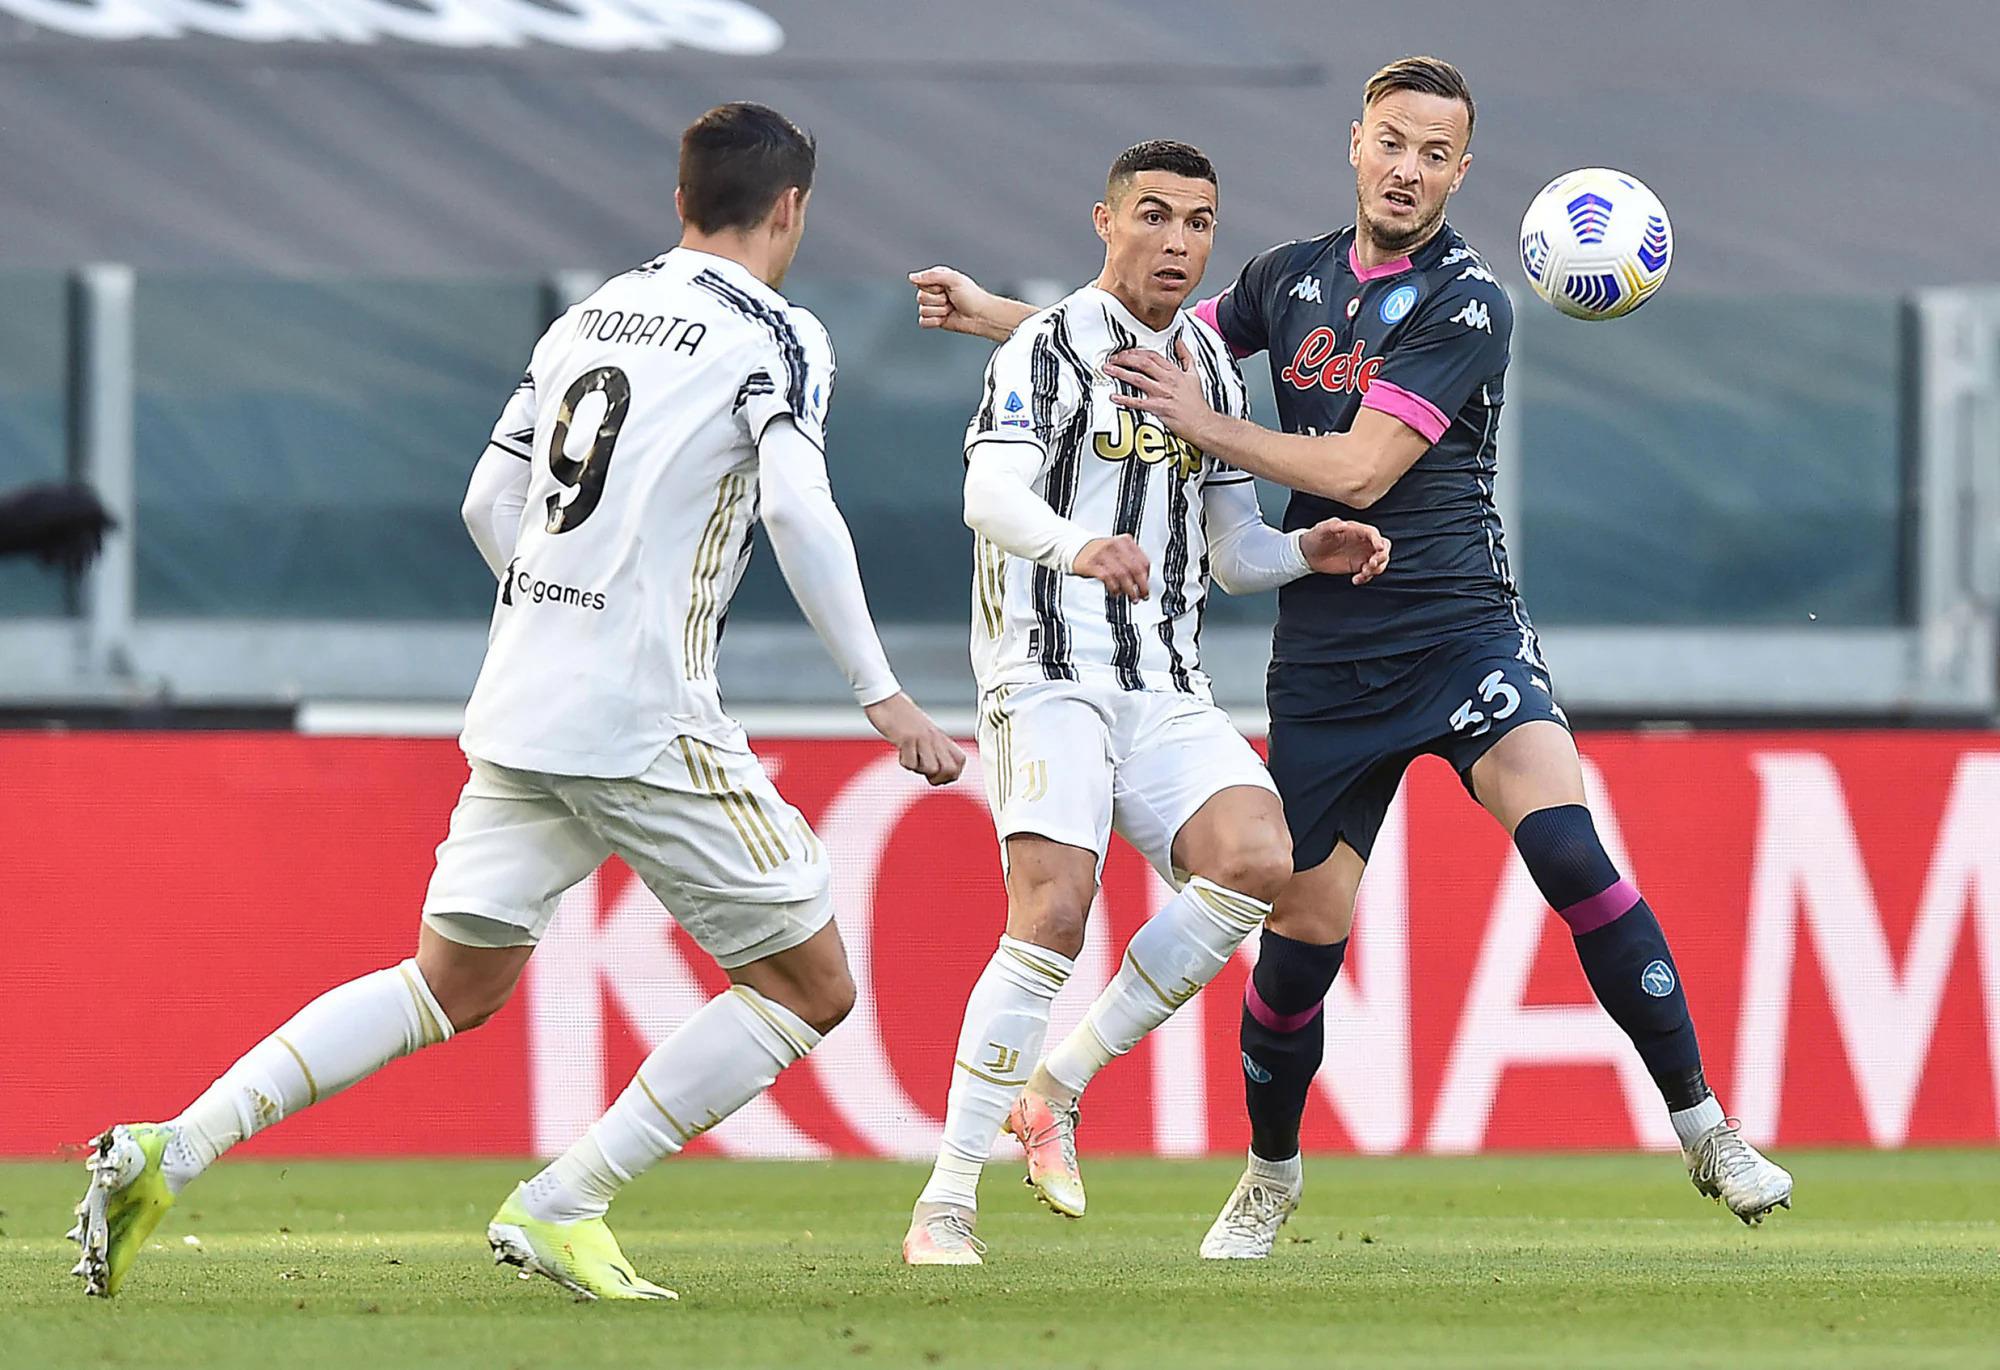 Ronaldo bersinar, membawa keunggulan awal bagi Juventus.  Foto: ANSA